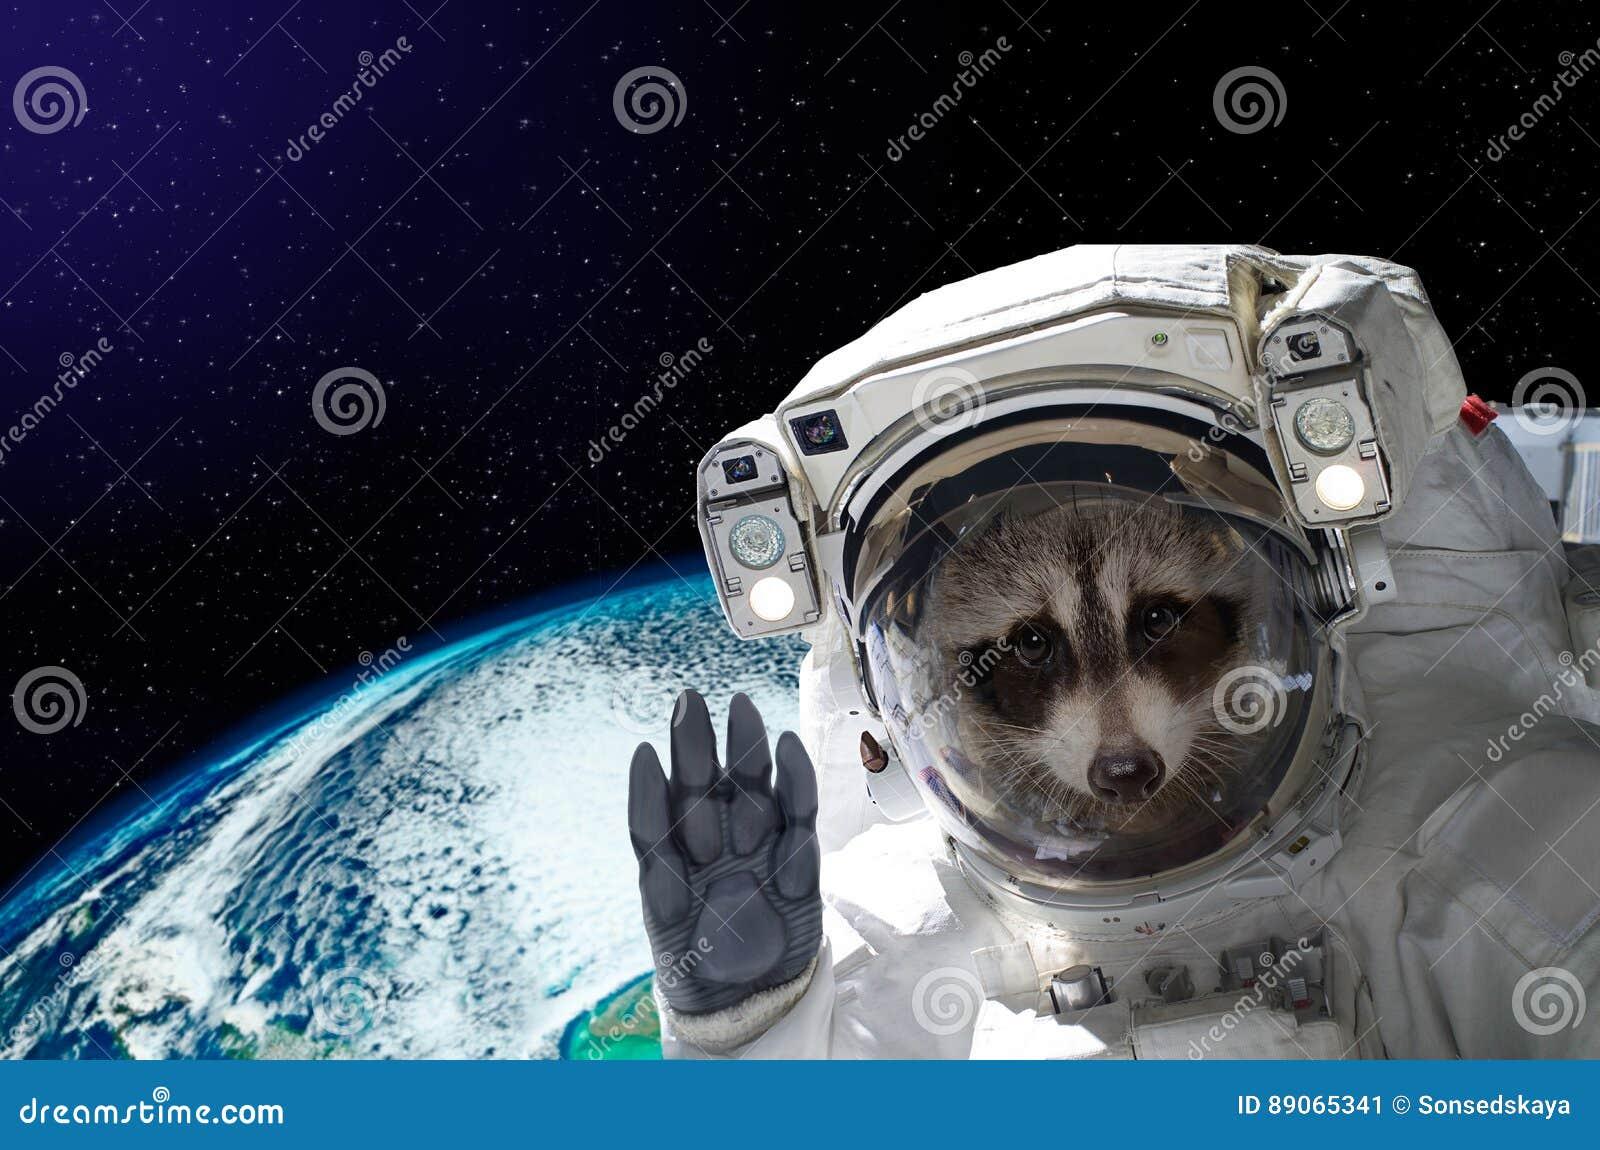 portrait-raccoon-astronaut-space-backgro